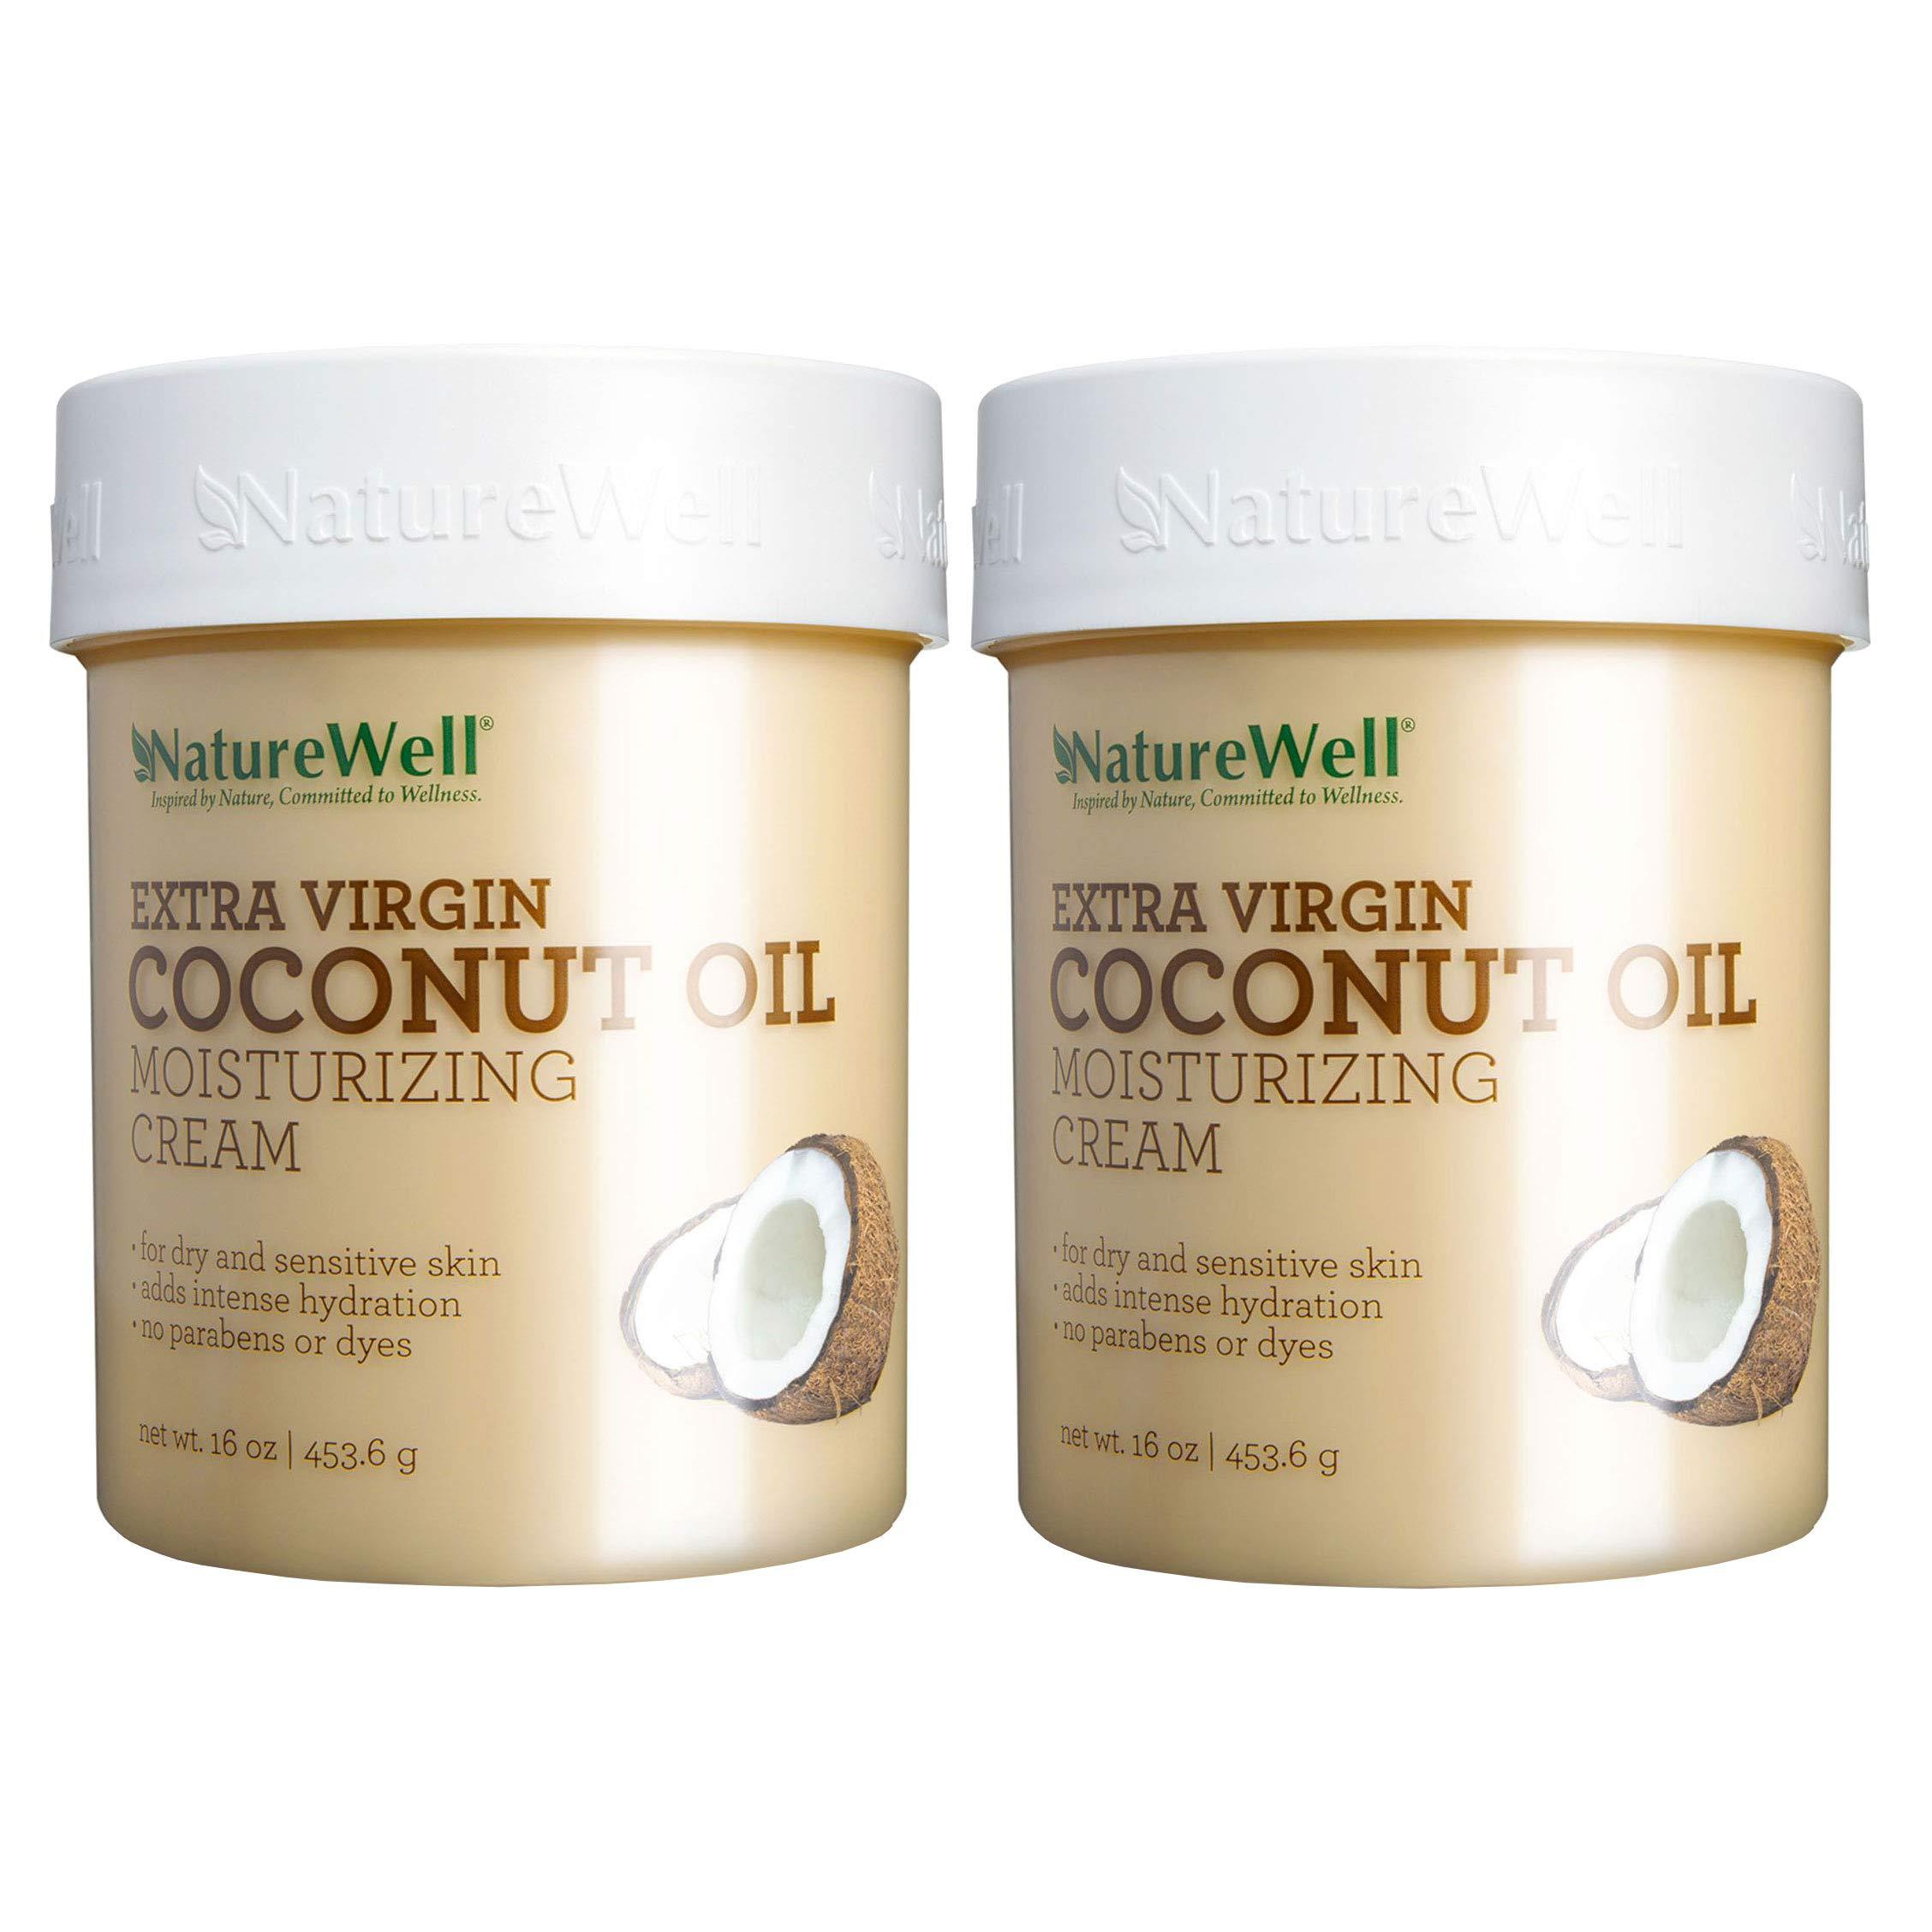 NatureWell Extra Virgin Coconut Oil Moisturizing Cream, 16 oz. Pack of 2